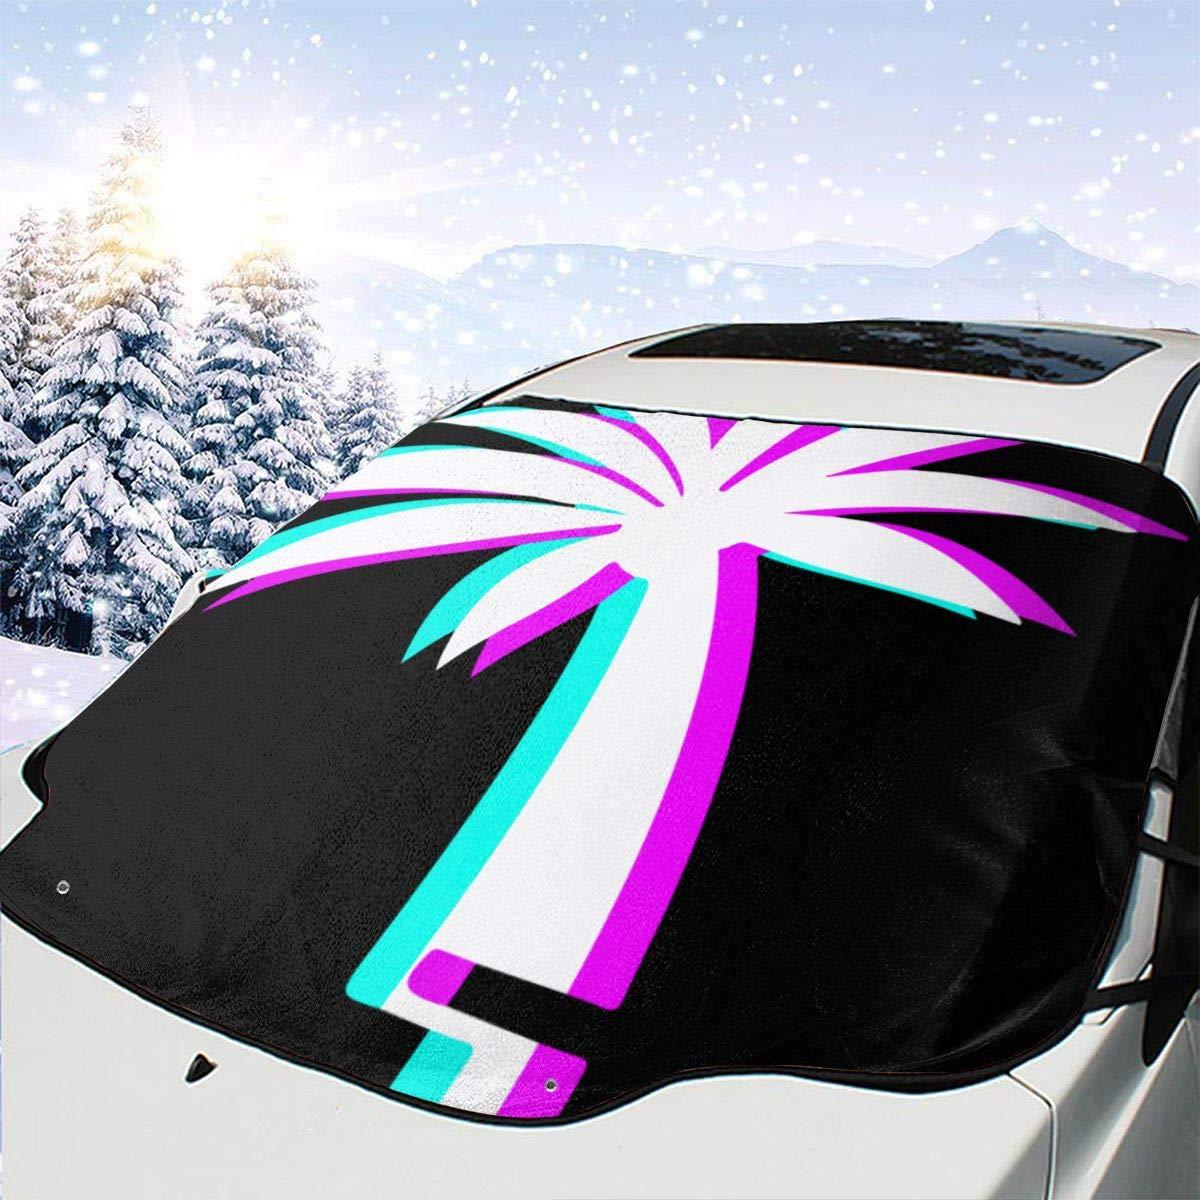 Palm Tree Auto Sun Shade for Cute Car Popular brand Max 82% OFF in the world Sunsha Foldable Windshield